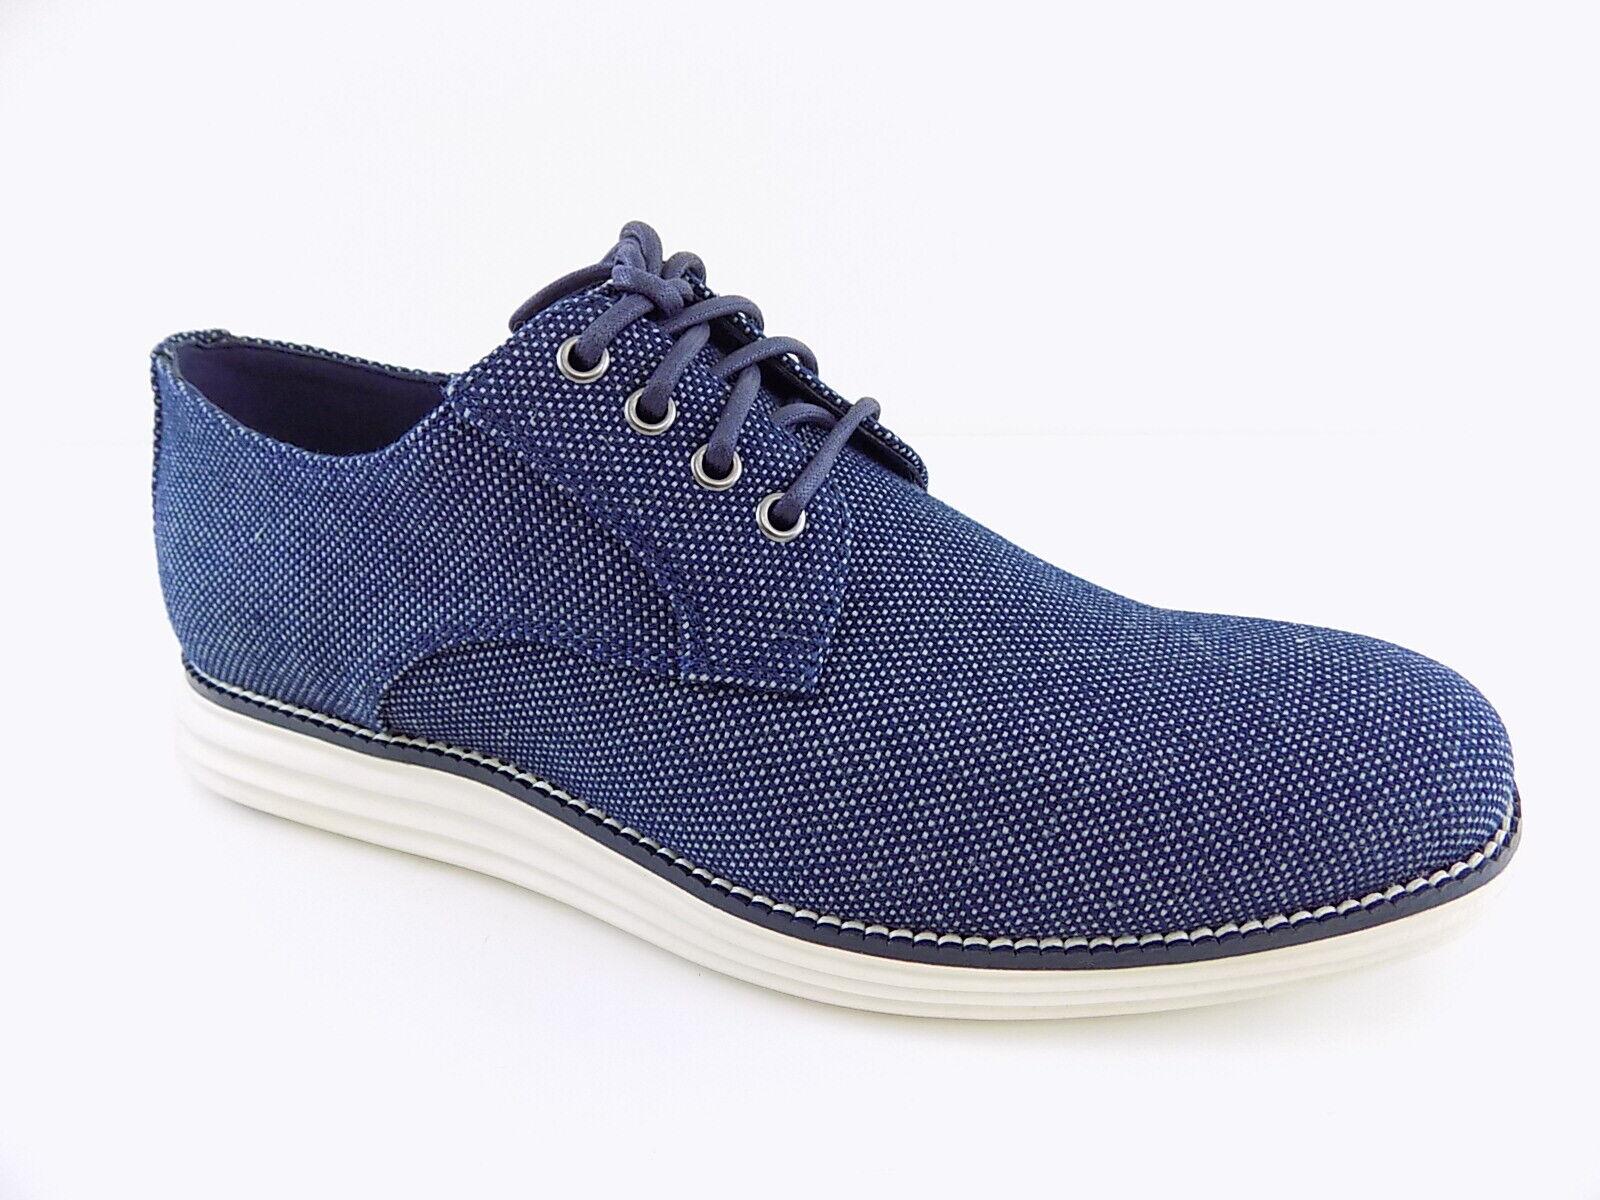 Cole Haan Original Grand Plain Toe bleu Homme Taille 8 M derbies chaussures